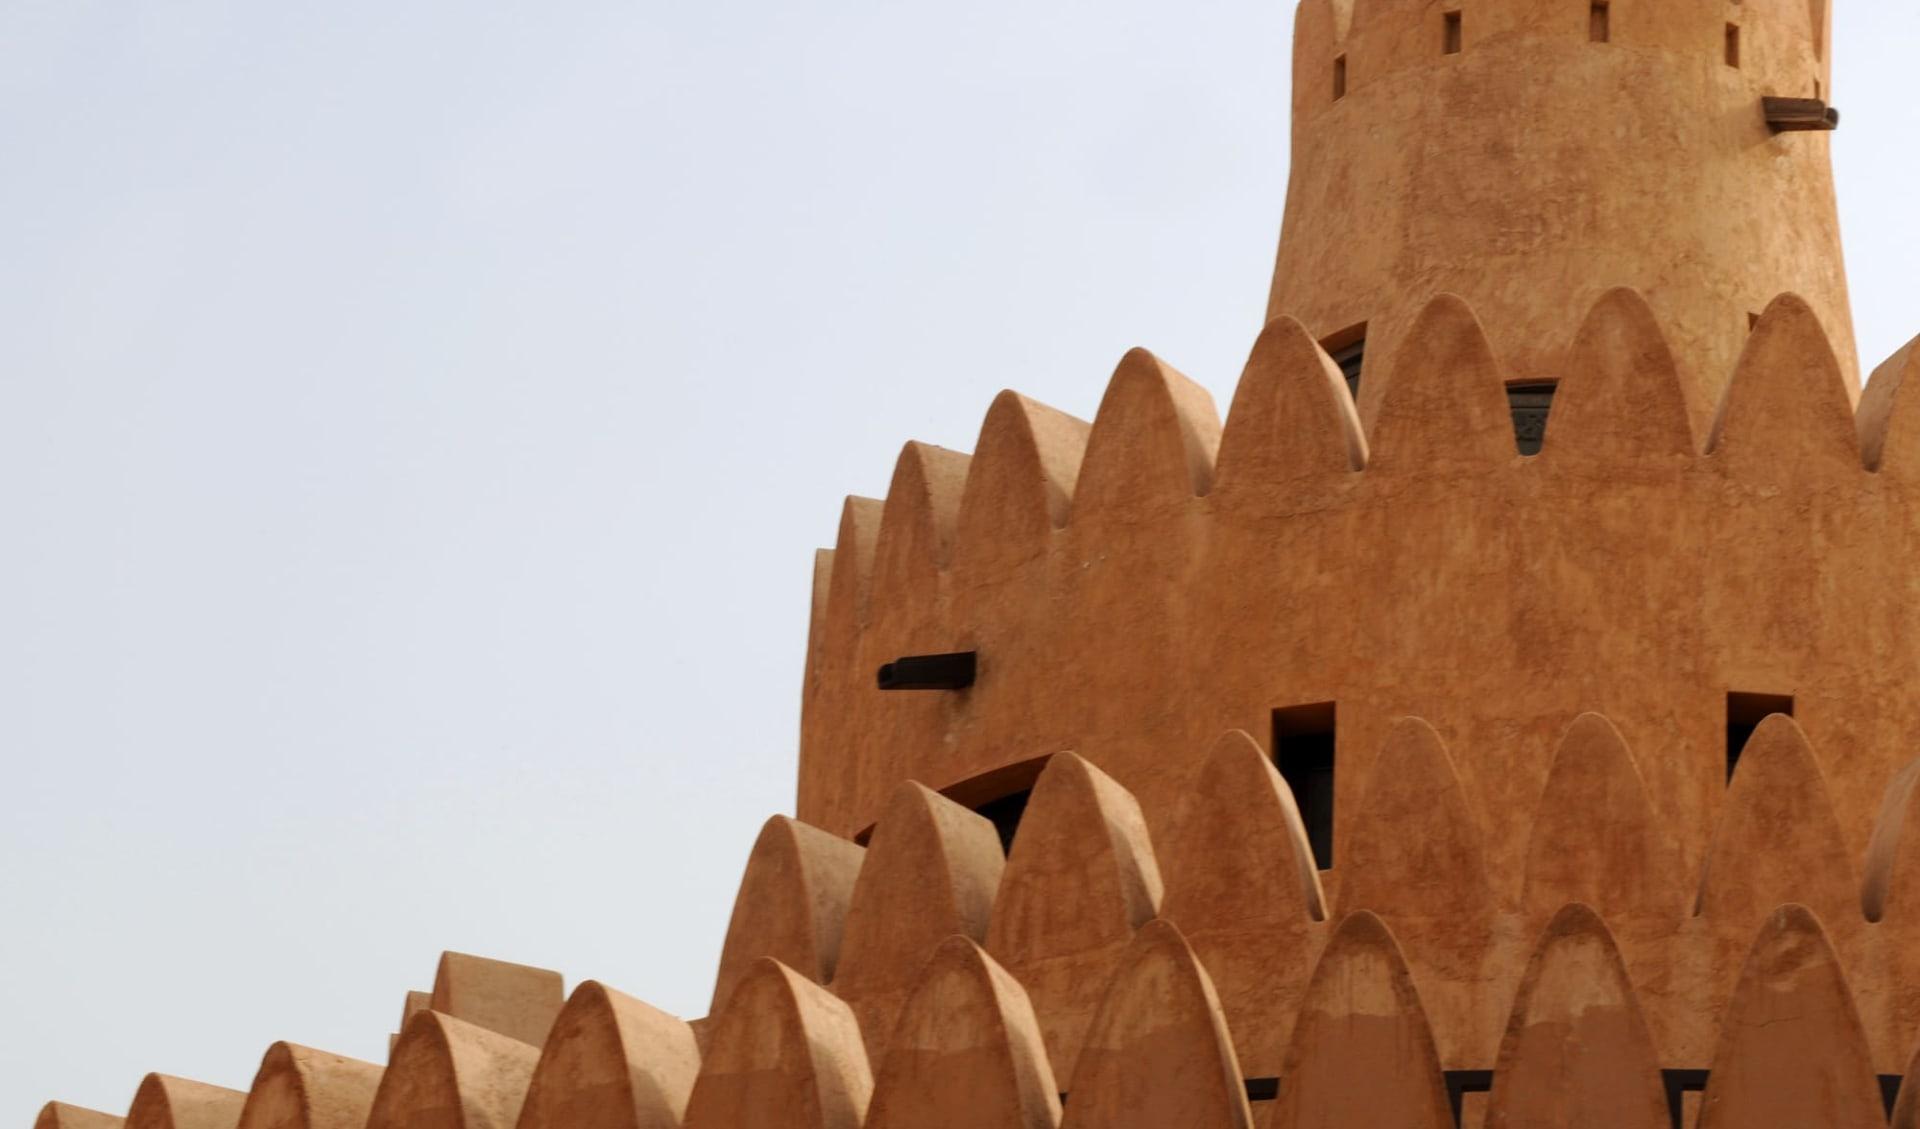 Faszination Hajar Gebirge ab Dubai: Al Ain Palace